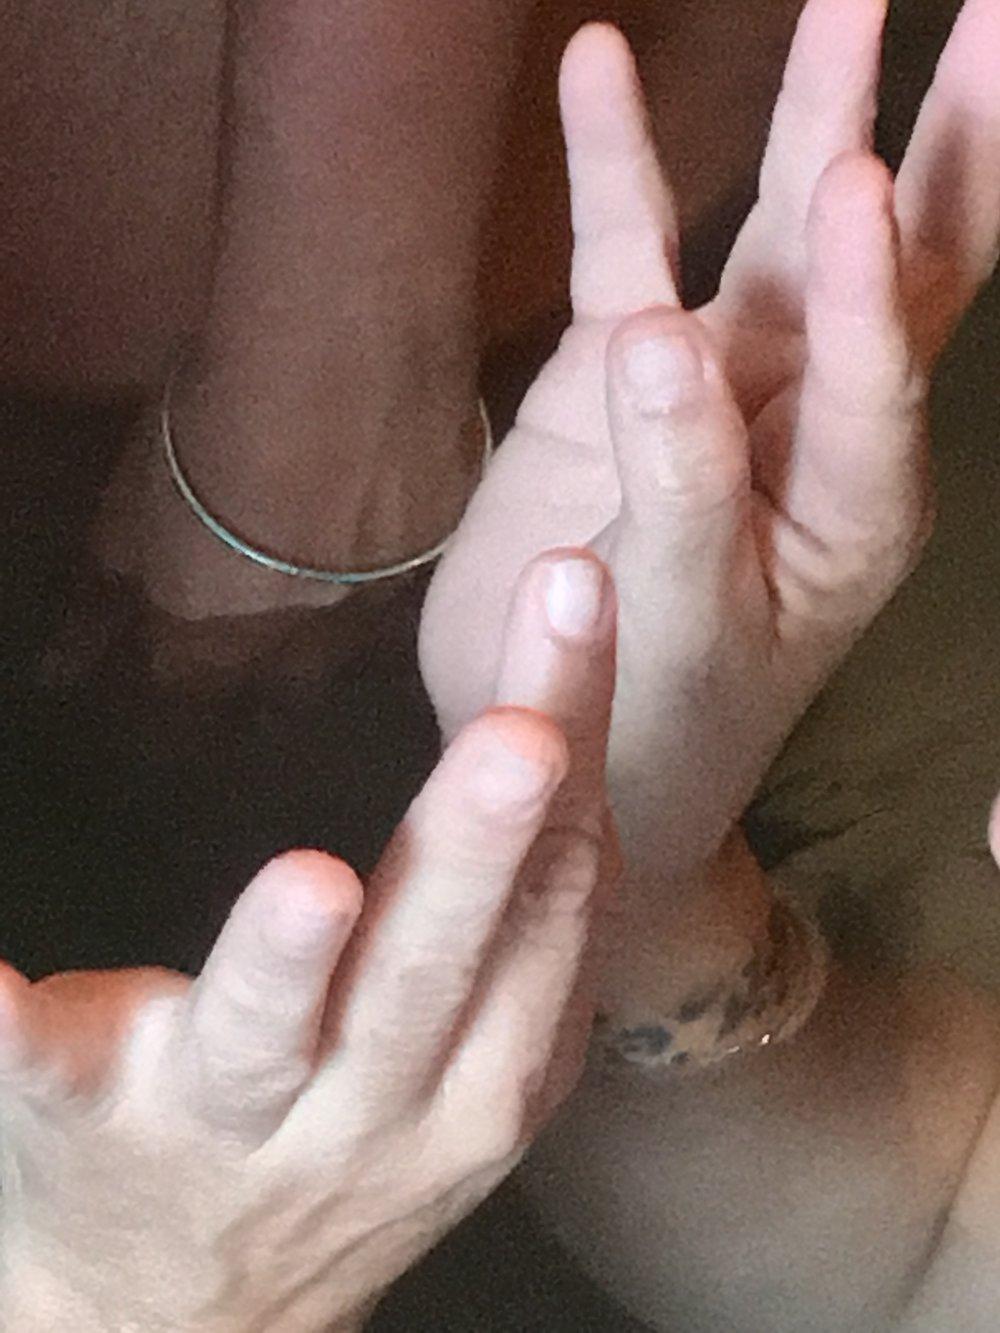 IMG_0663 qiball fingers up.jpg